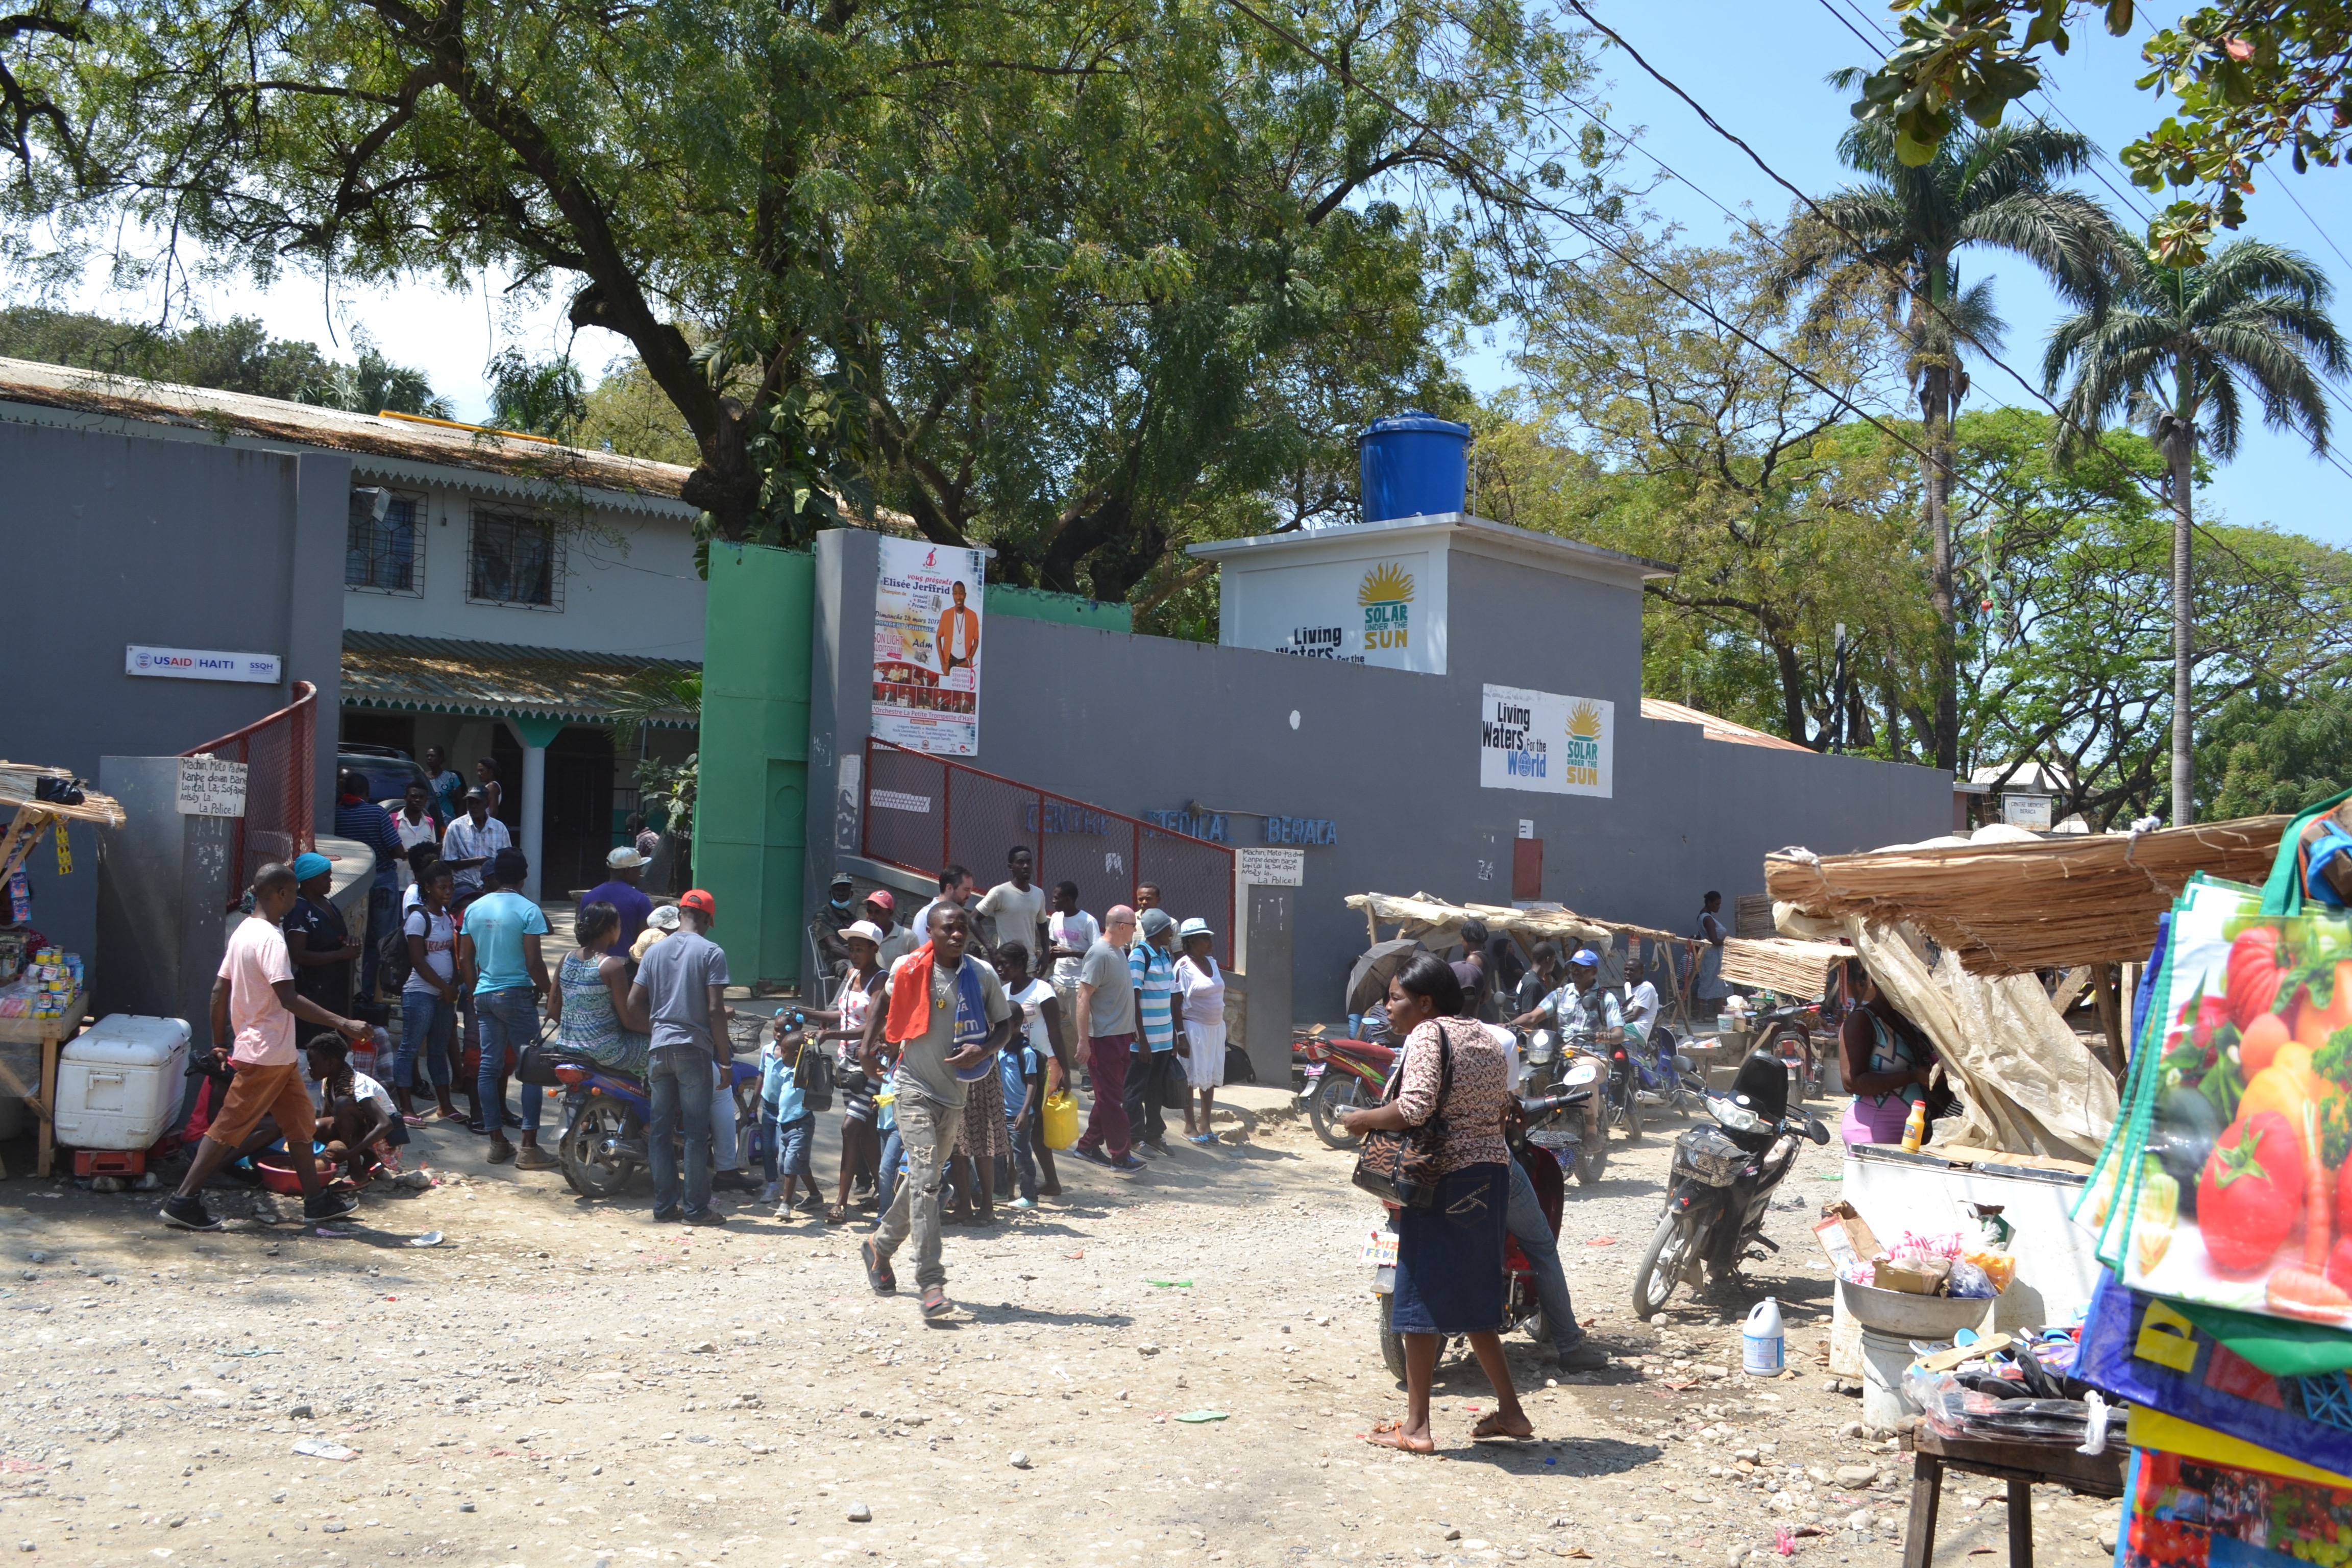 CMB Haiti in La Pointe, Haiti